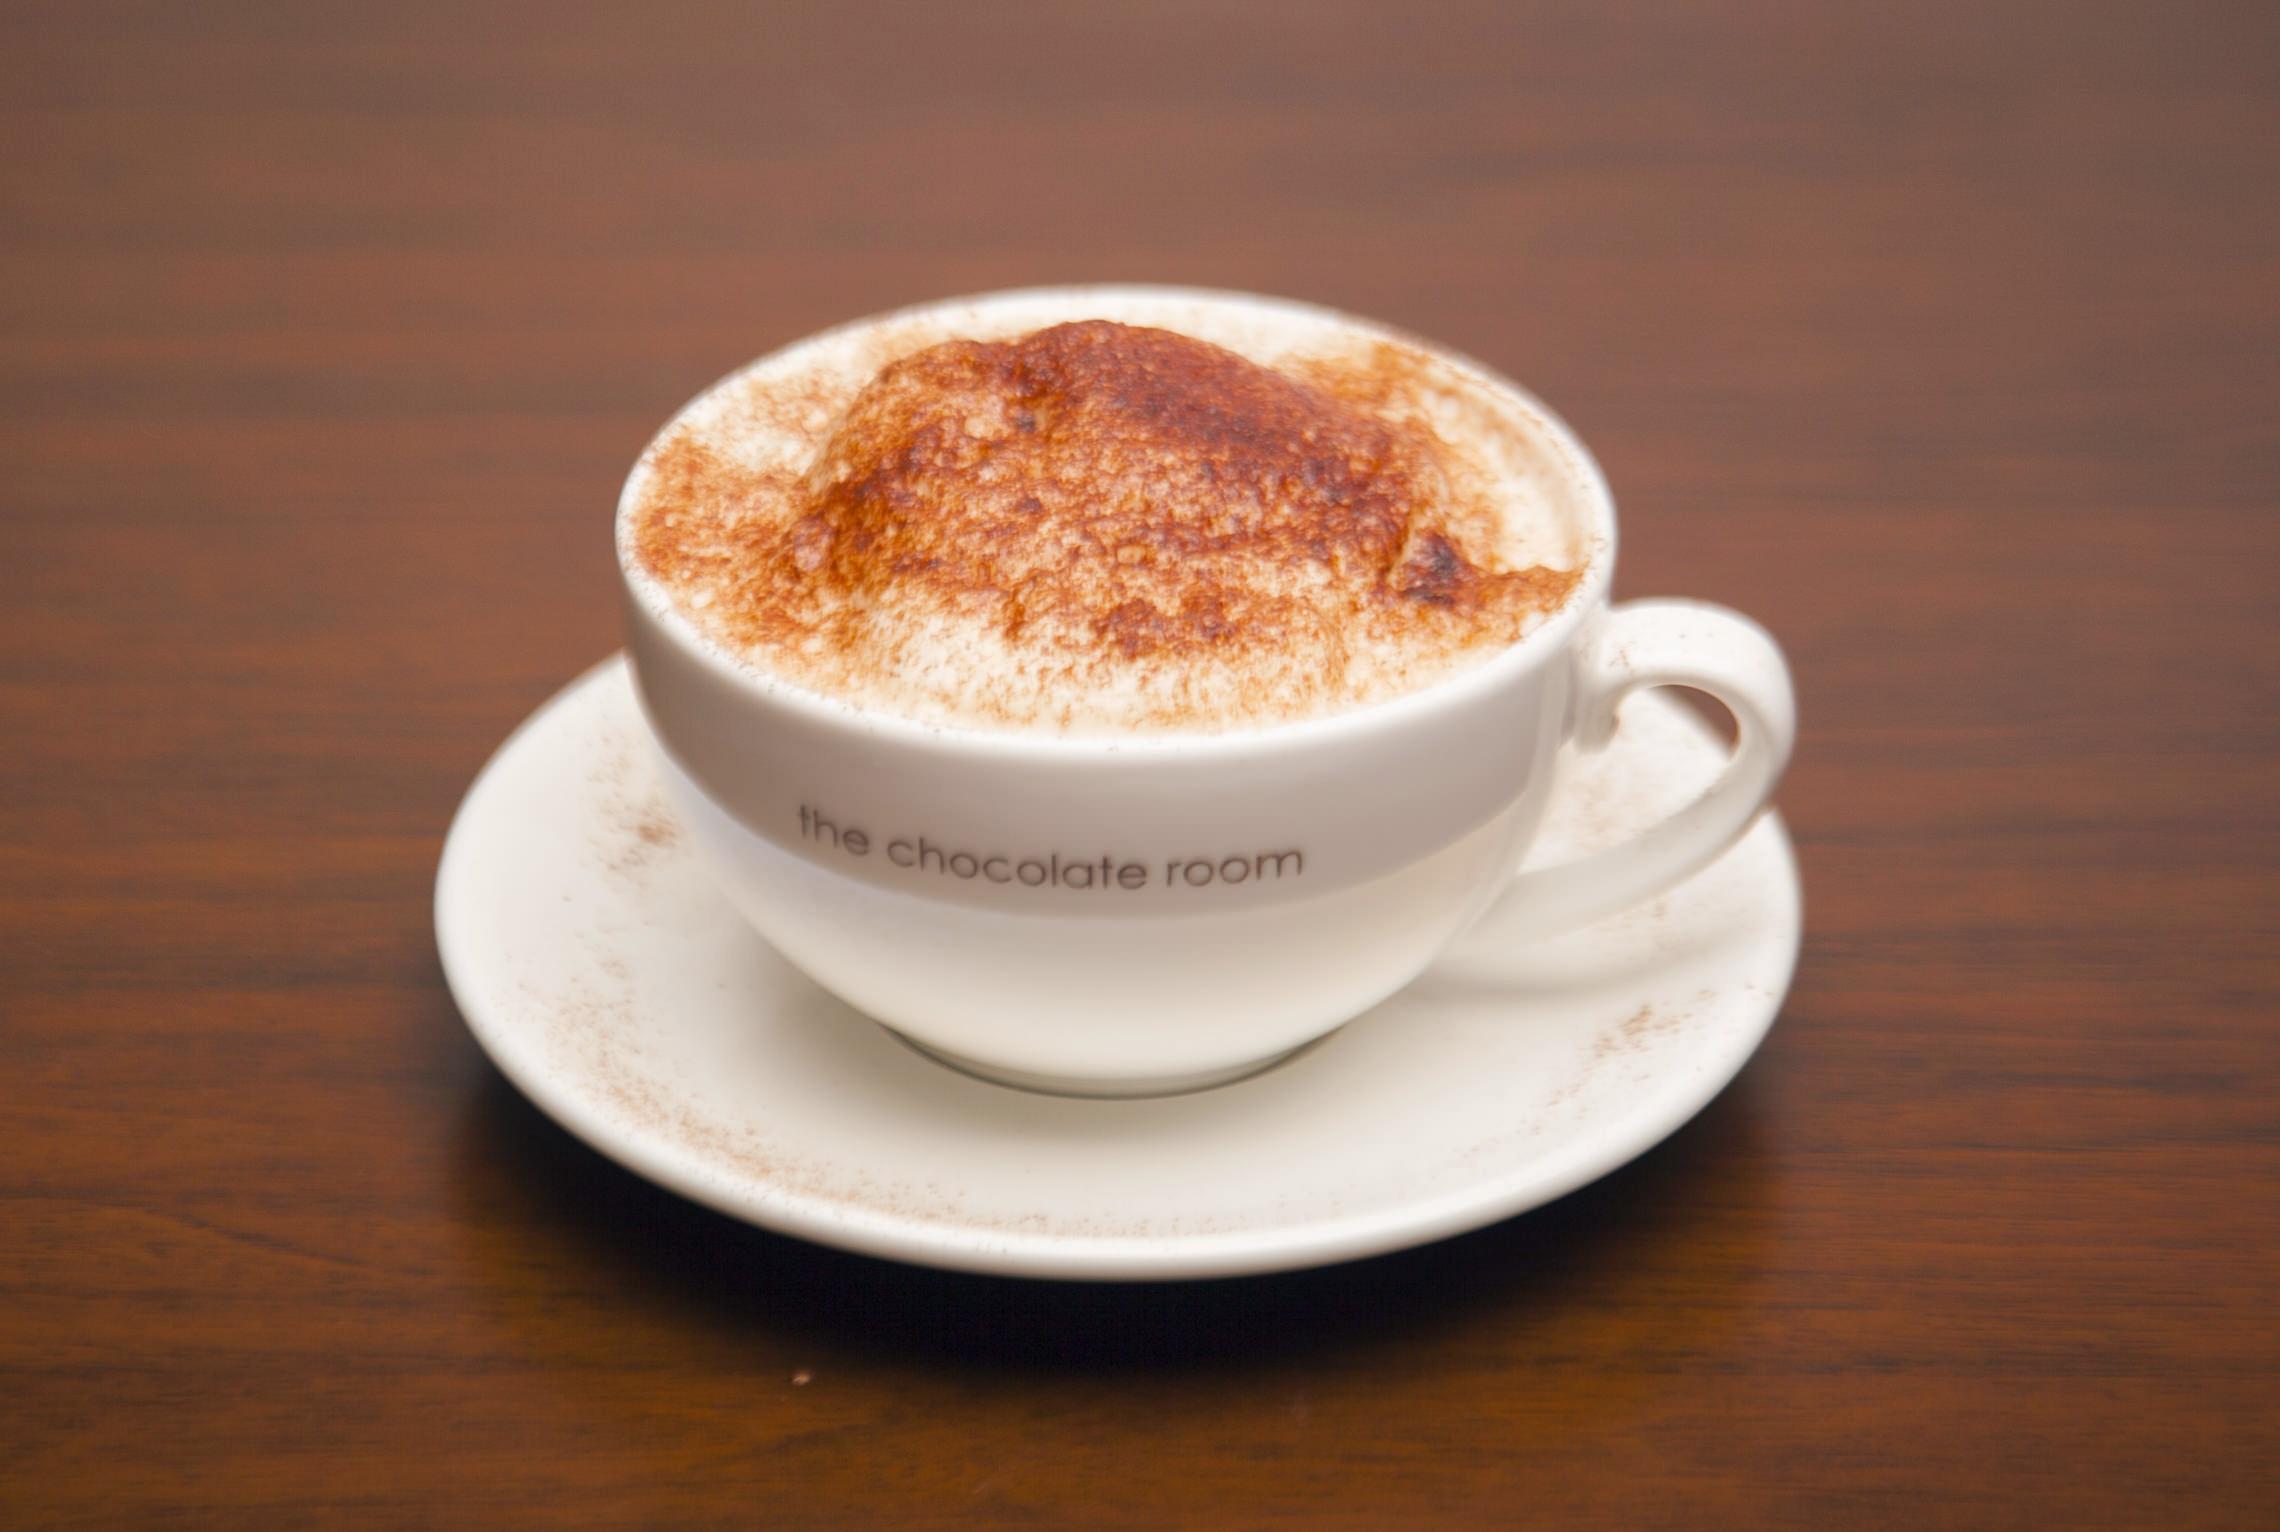 cappuccino-thechocolateroom